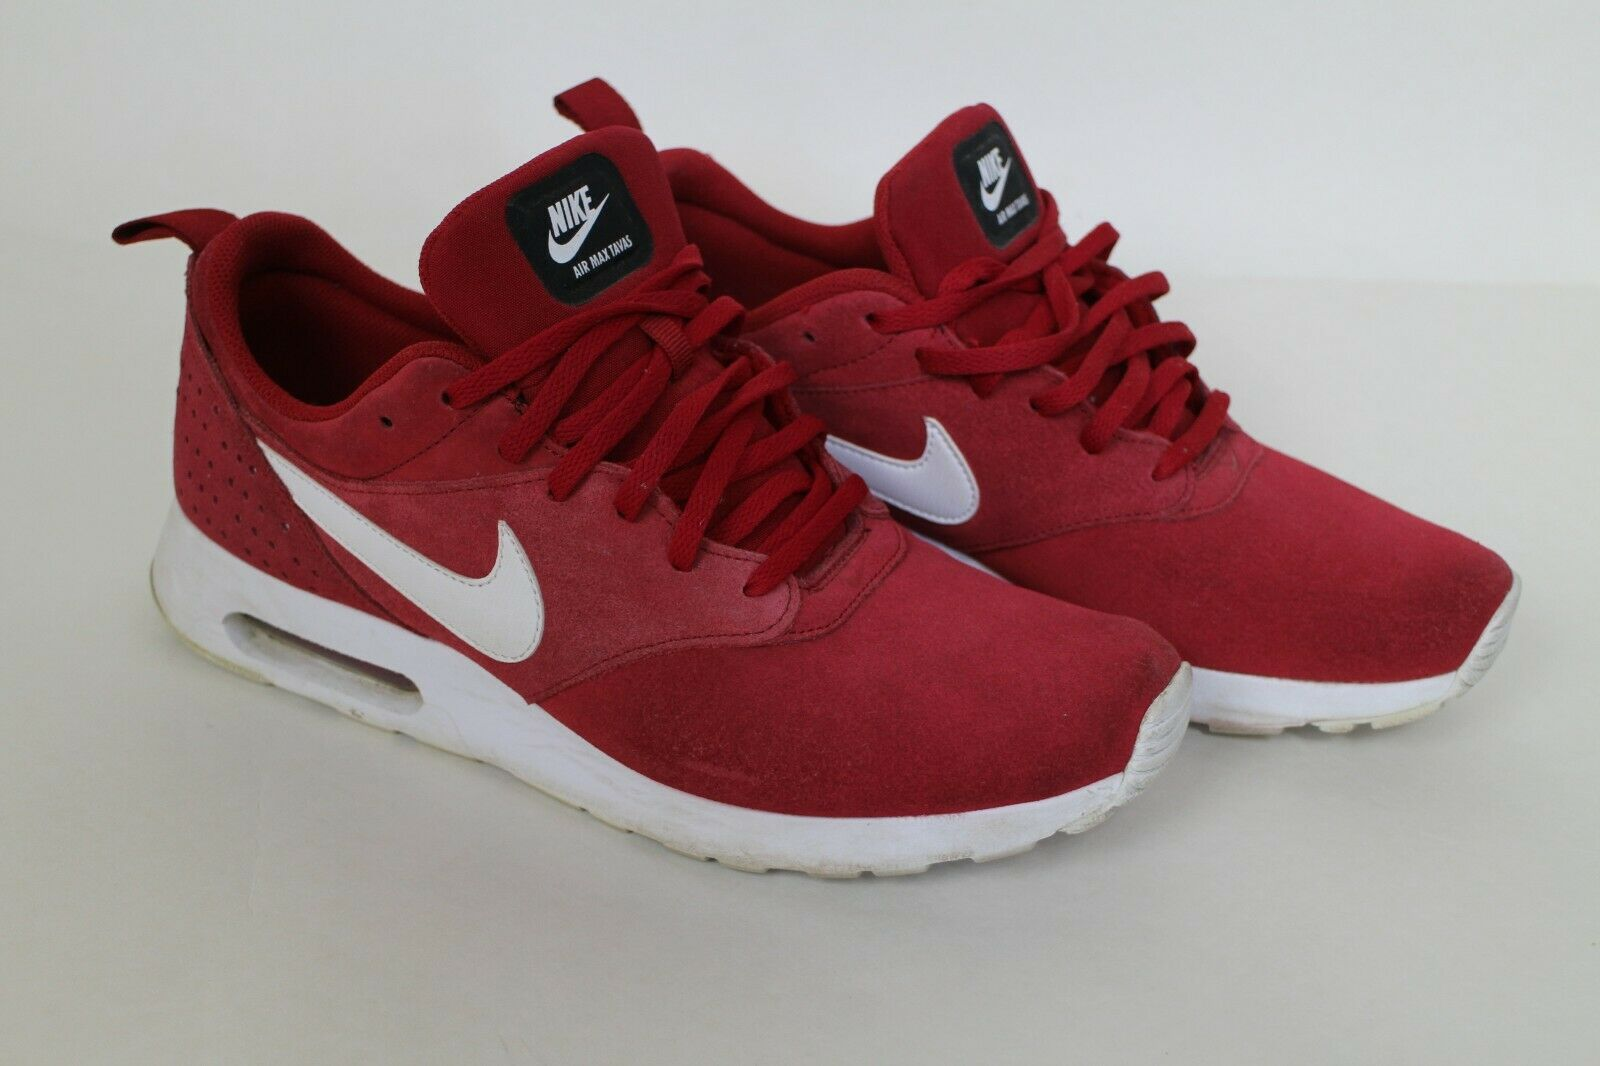 Nike Air Max Tavas Ltr Men's Sneaker 47 EU Black